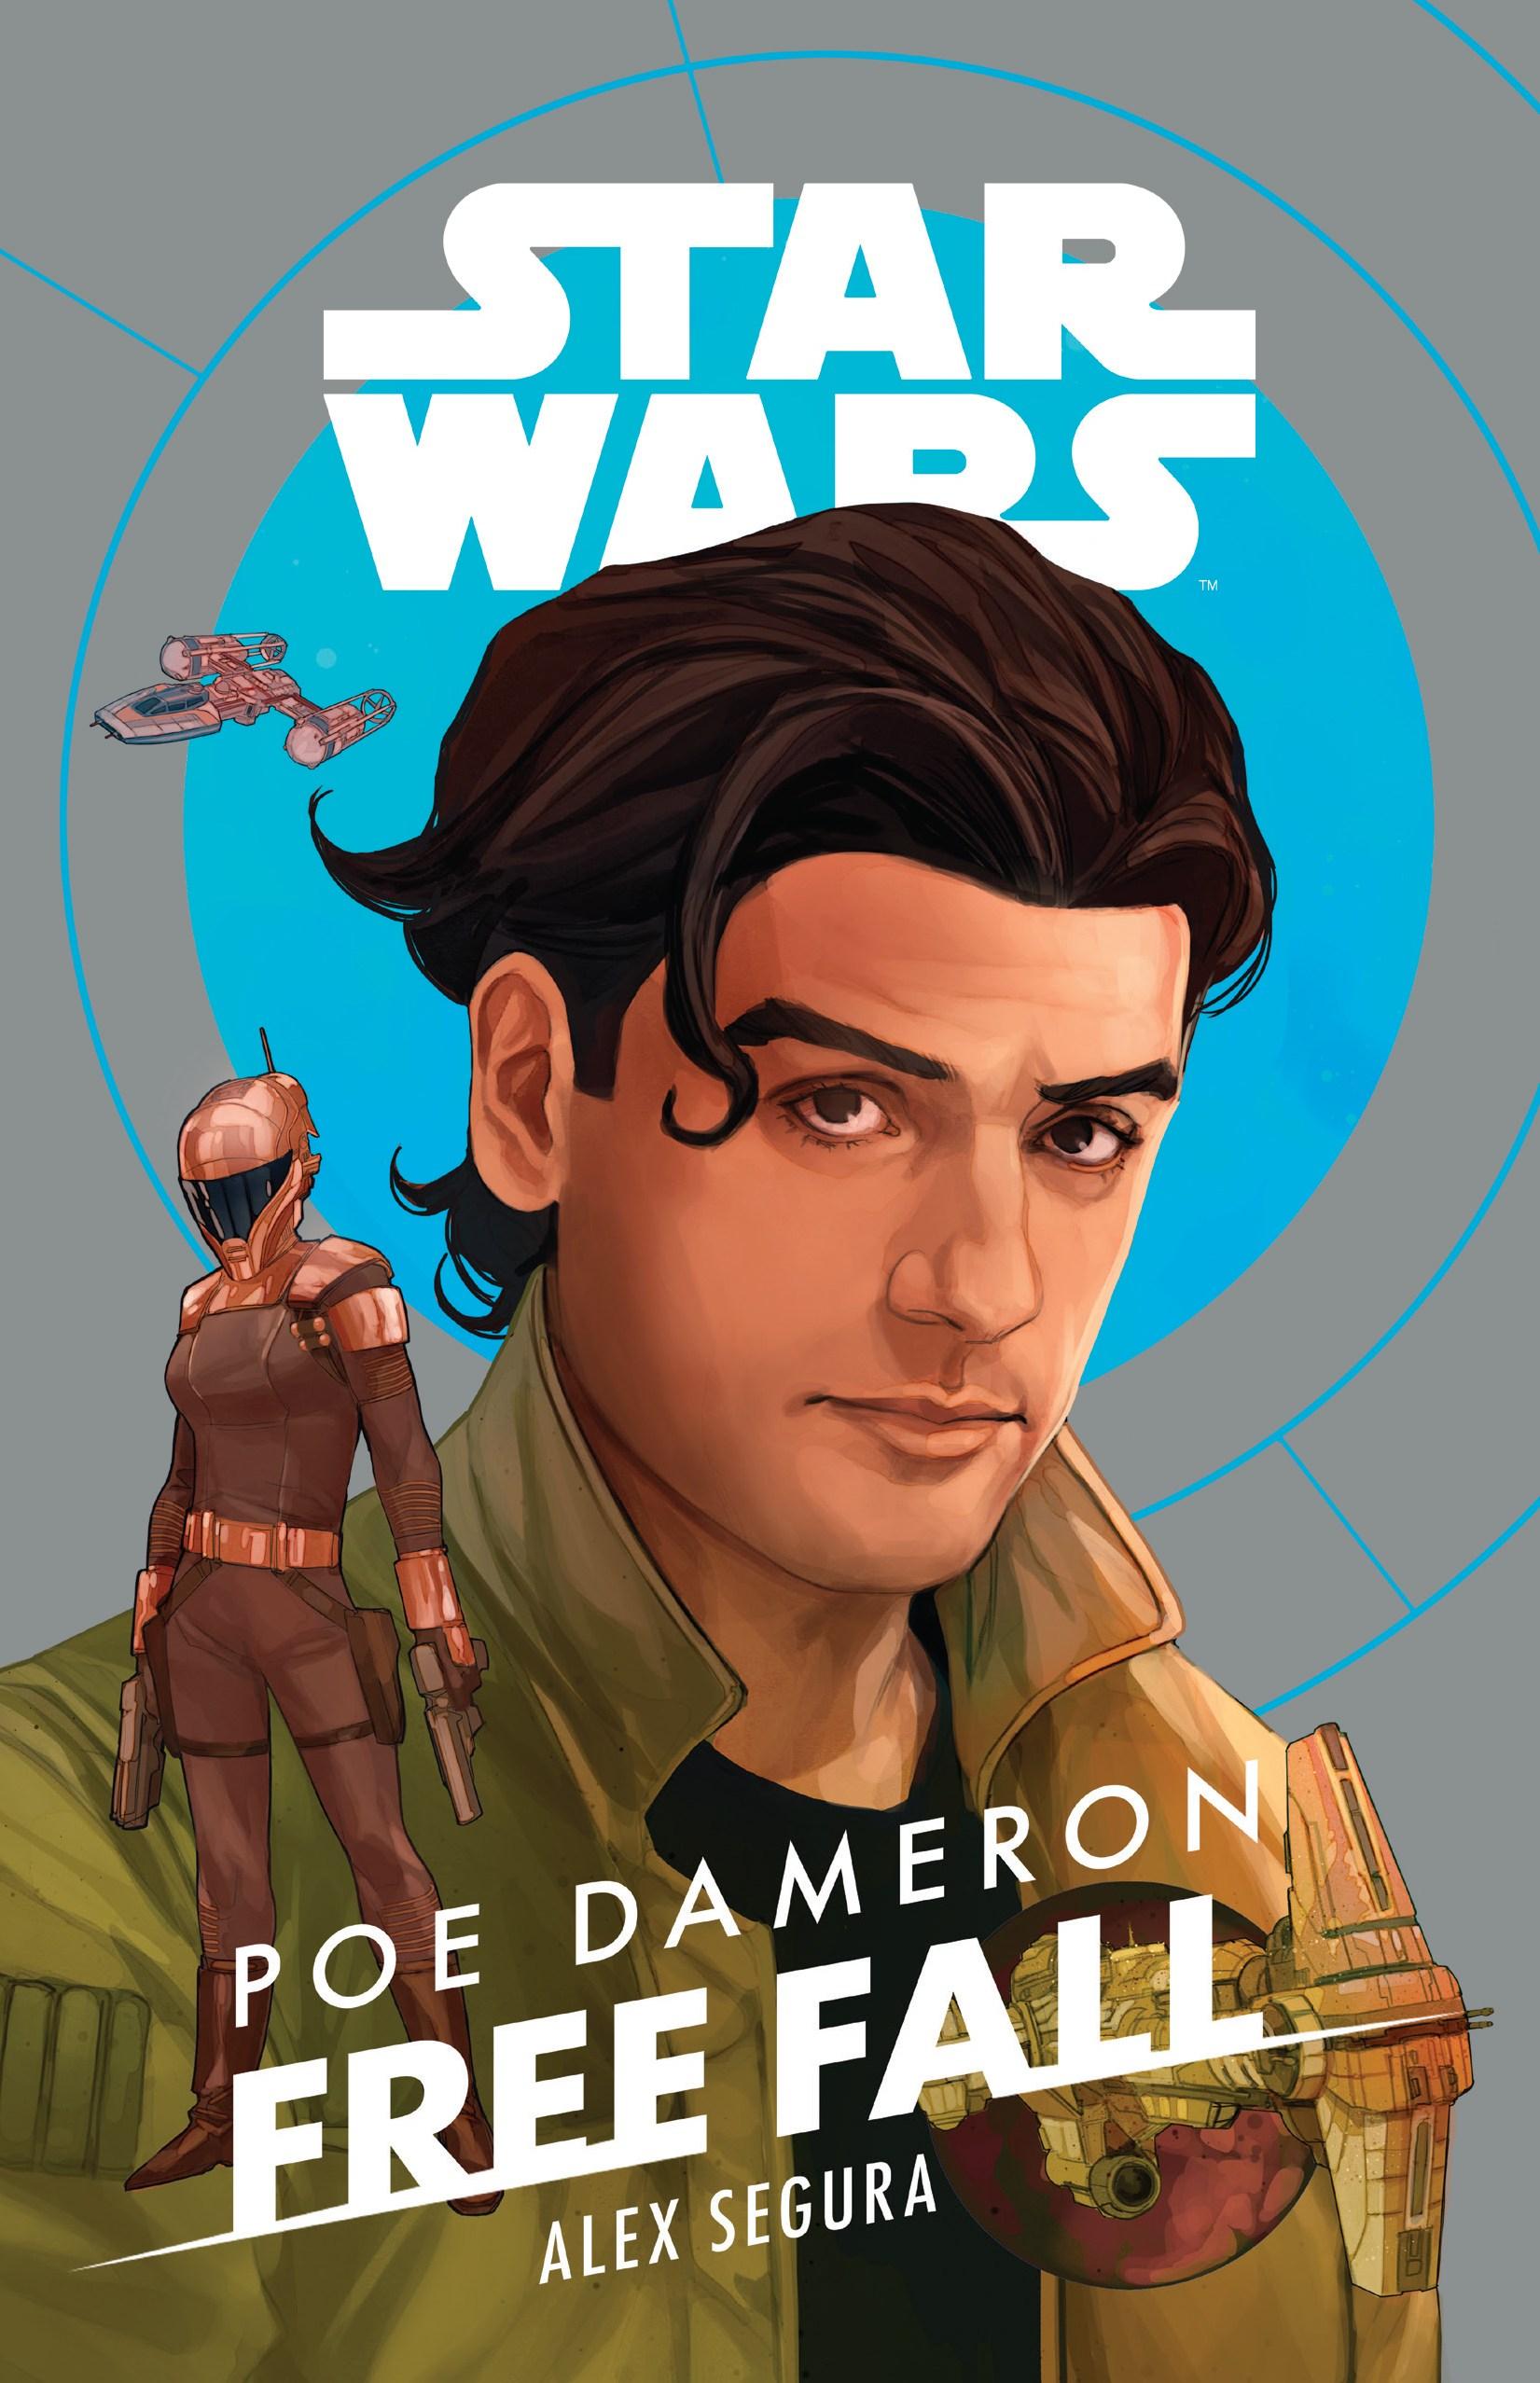 Poe Dameron Free Fall Wookieepedia Fandom